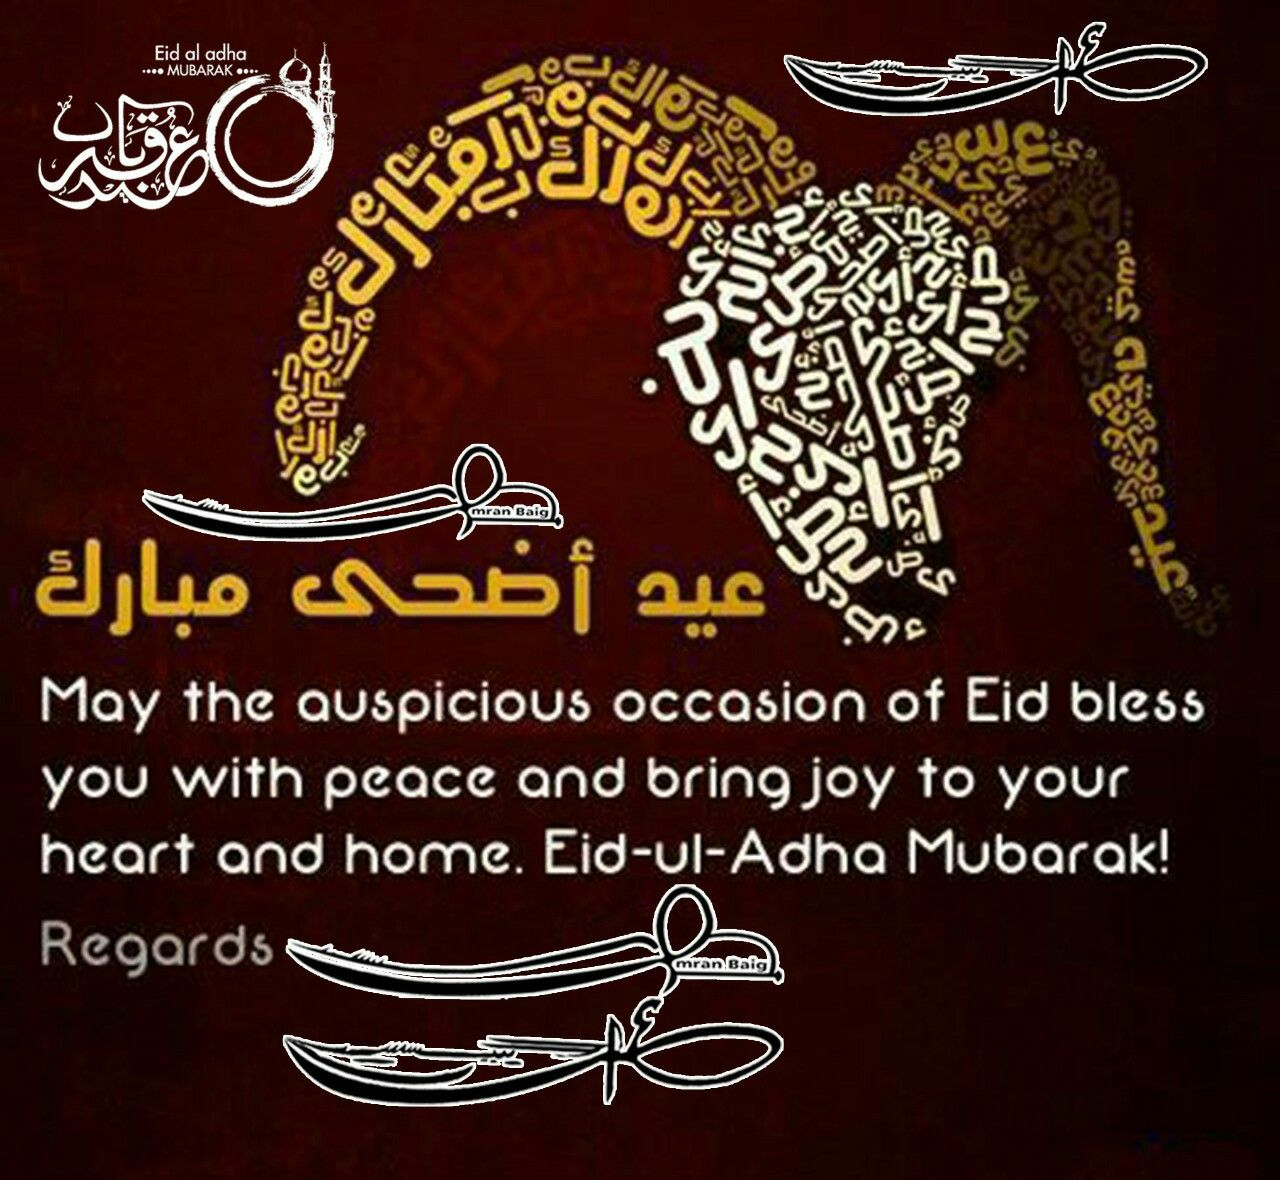 Pin By Alone Lyrics On Alone Lyrics Lyrics Eid Ul Adha Adha Mubarak